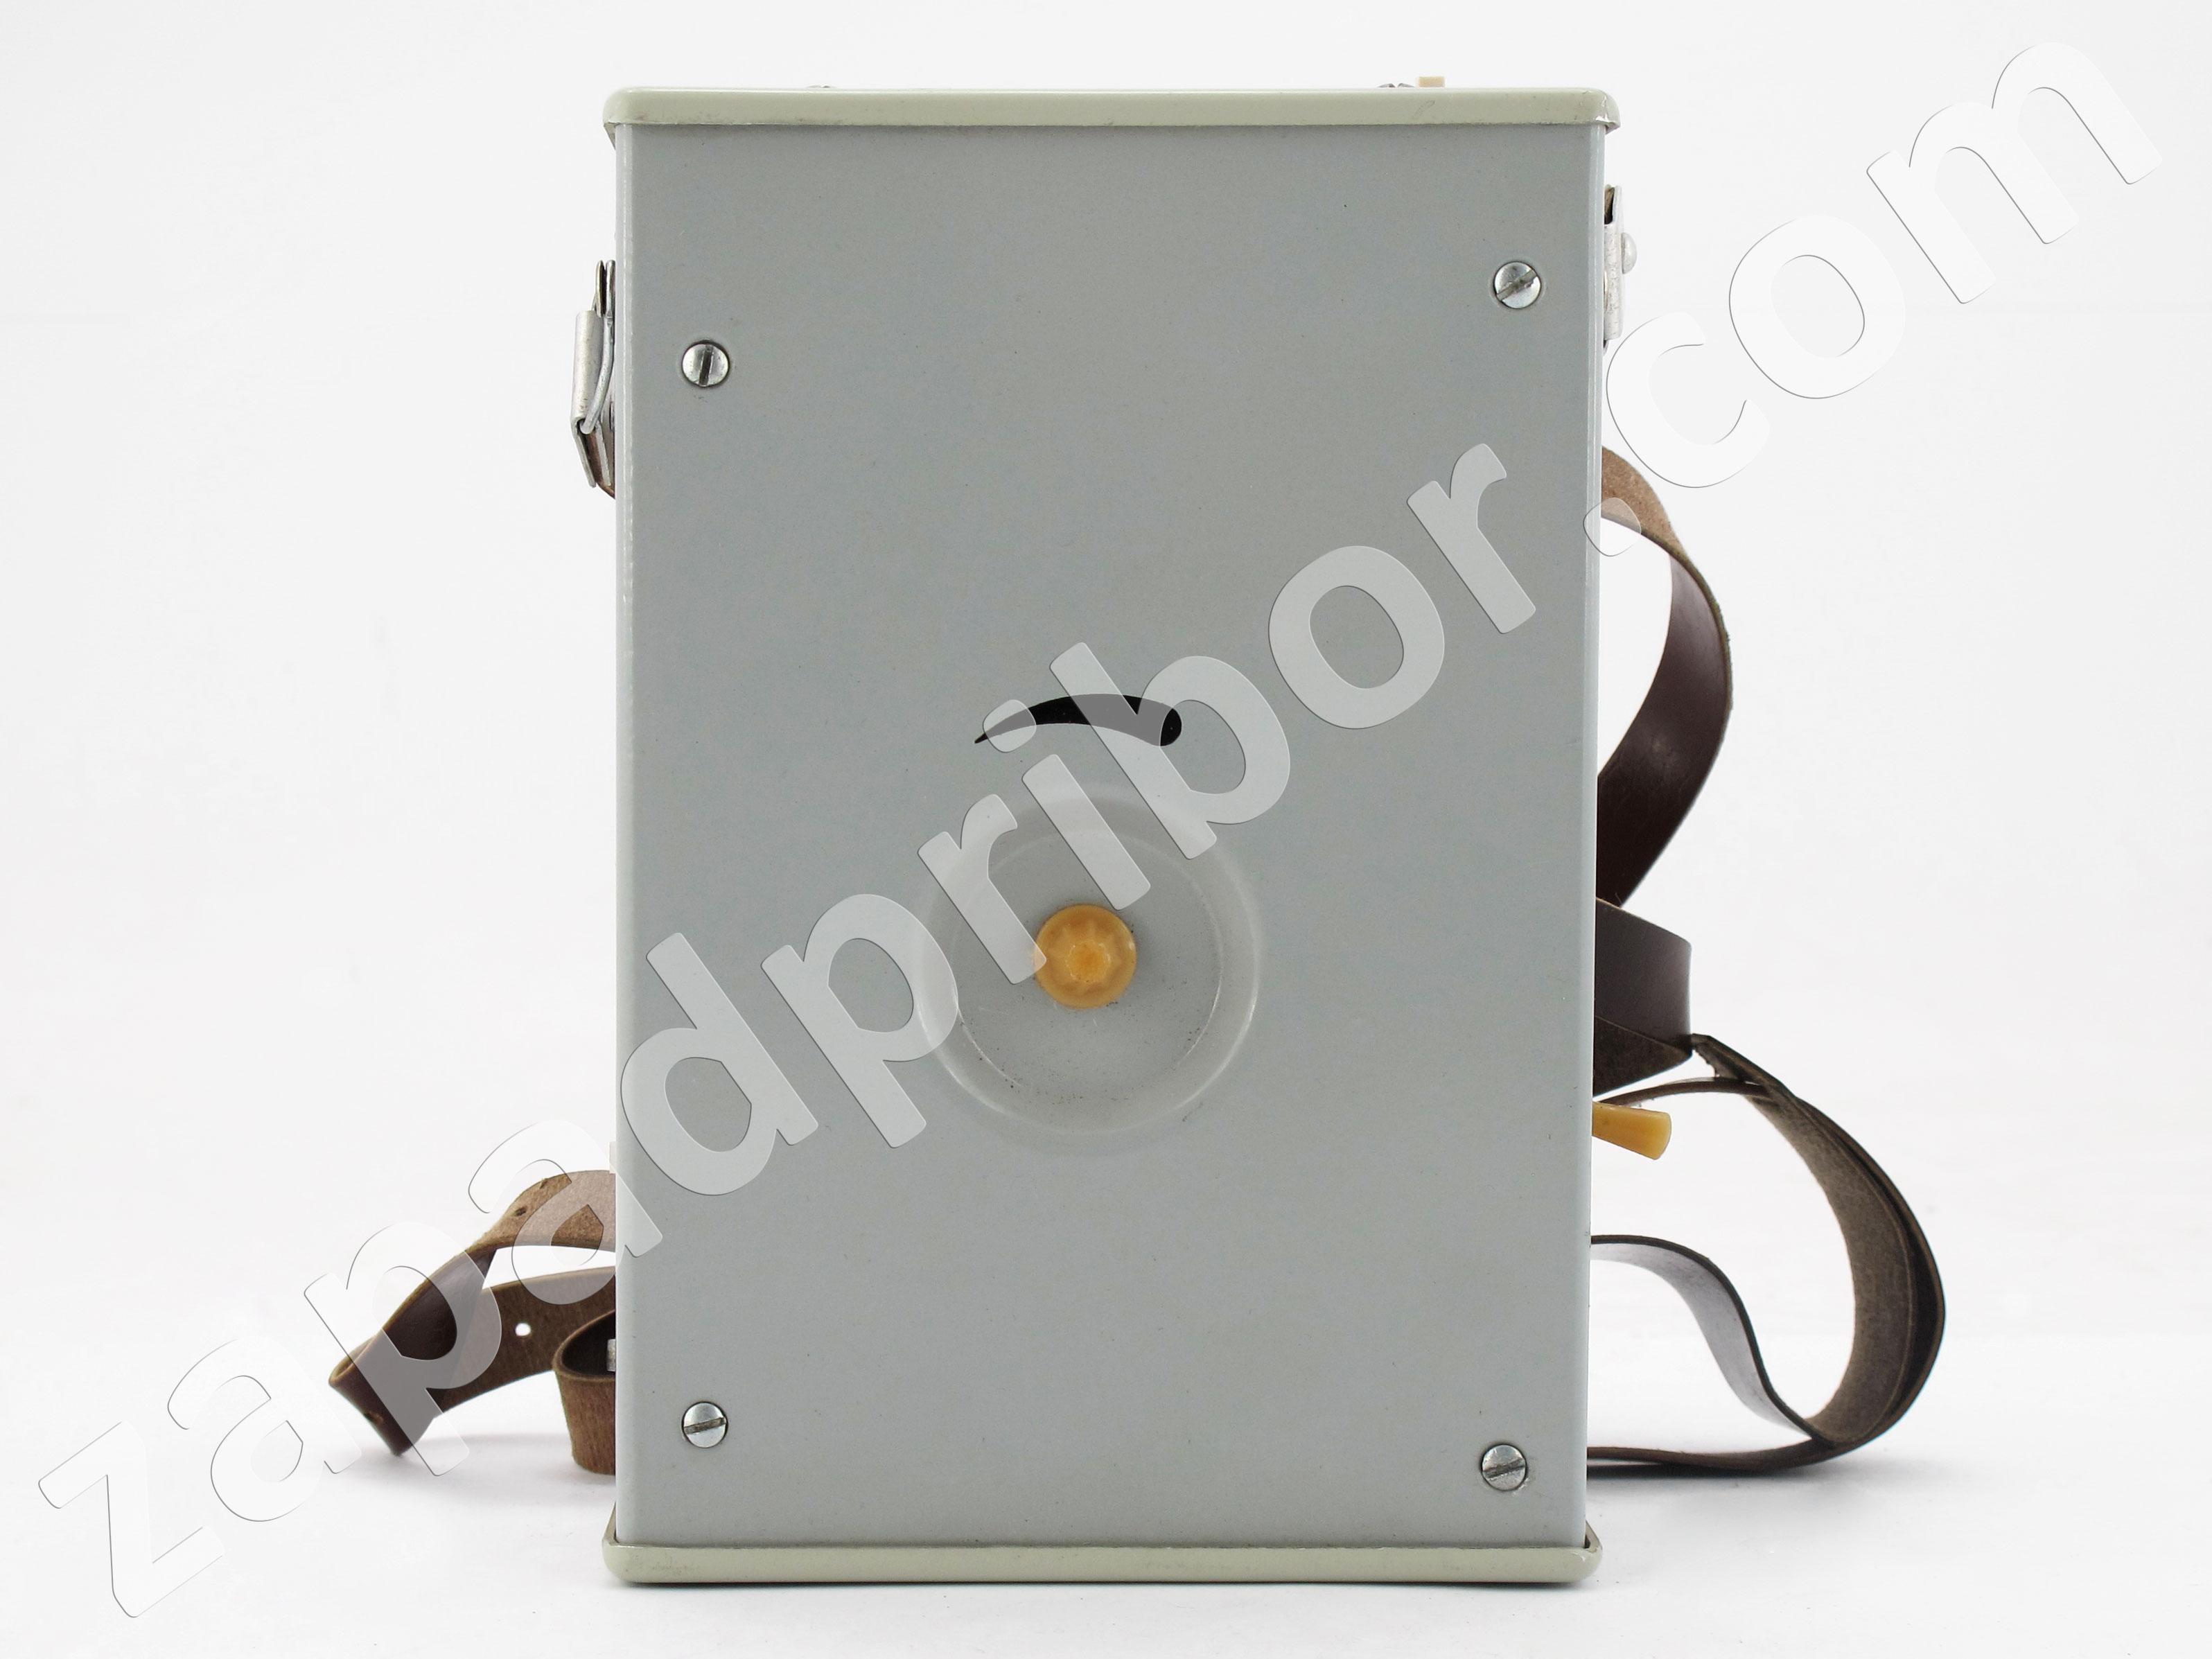 схема кабелеискателя ип 8